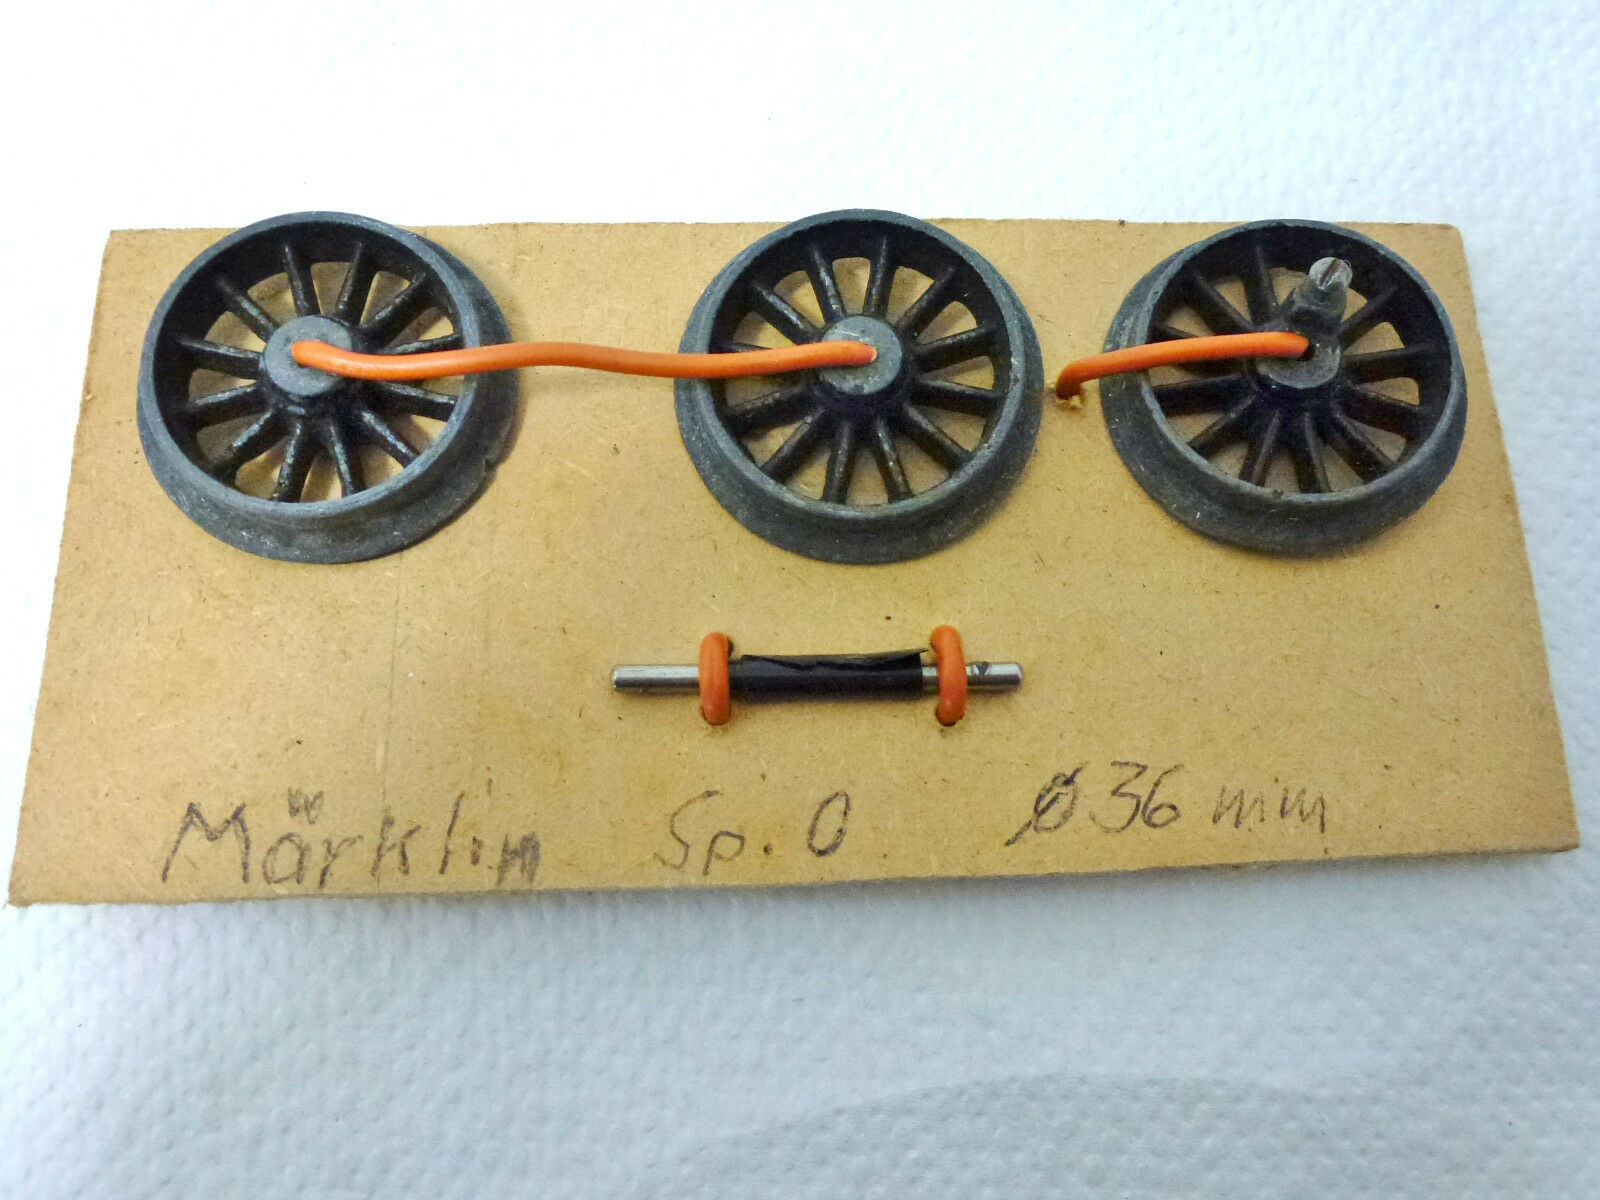 Märklin 3 Lokräder Spur 0 Ersatzteil    Elegantes Aussehen